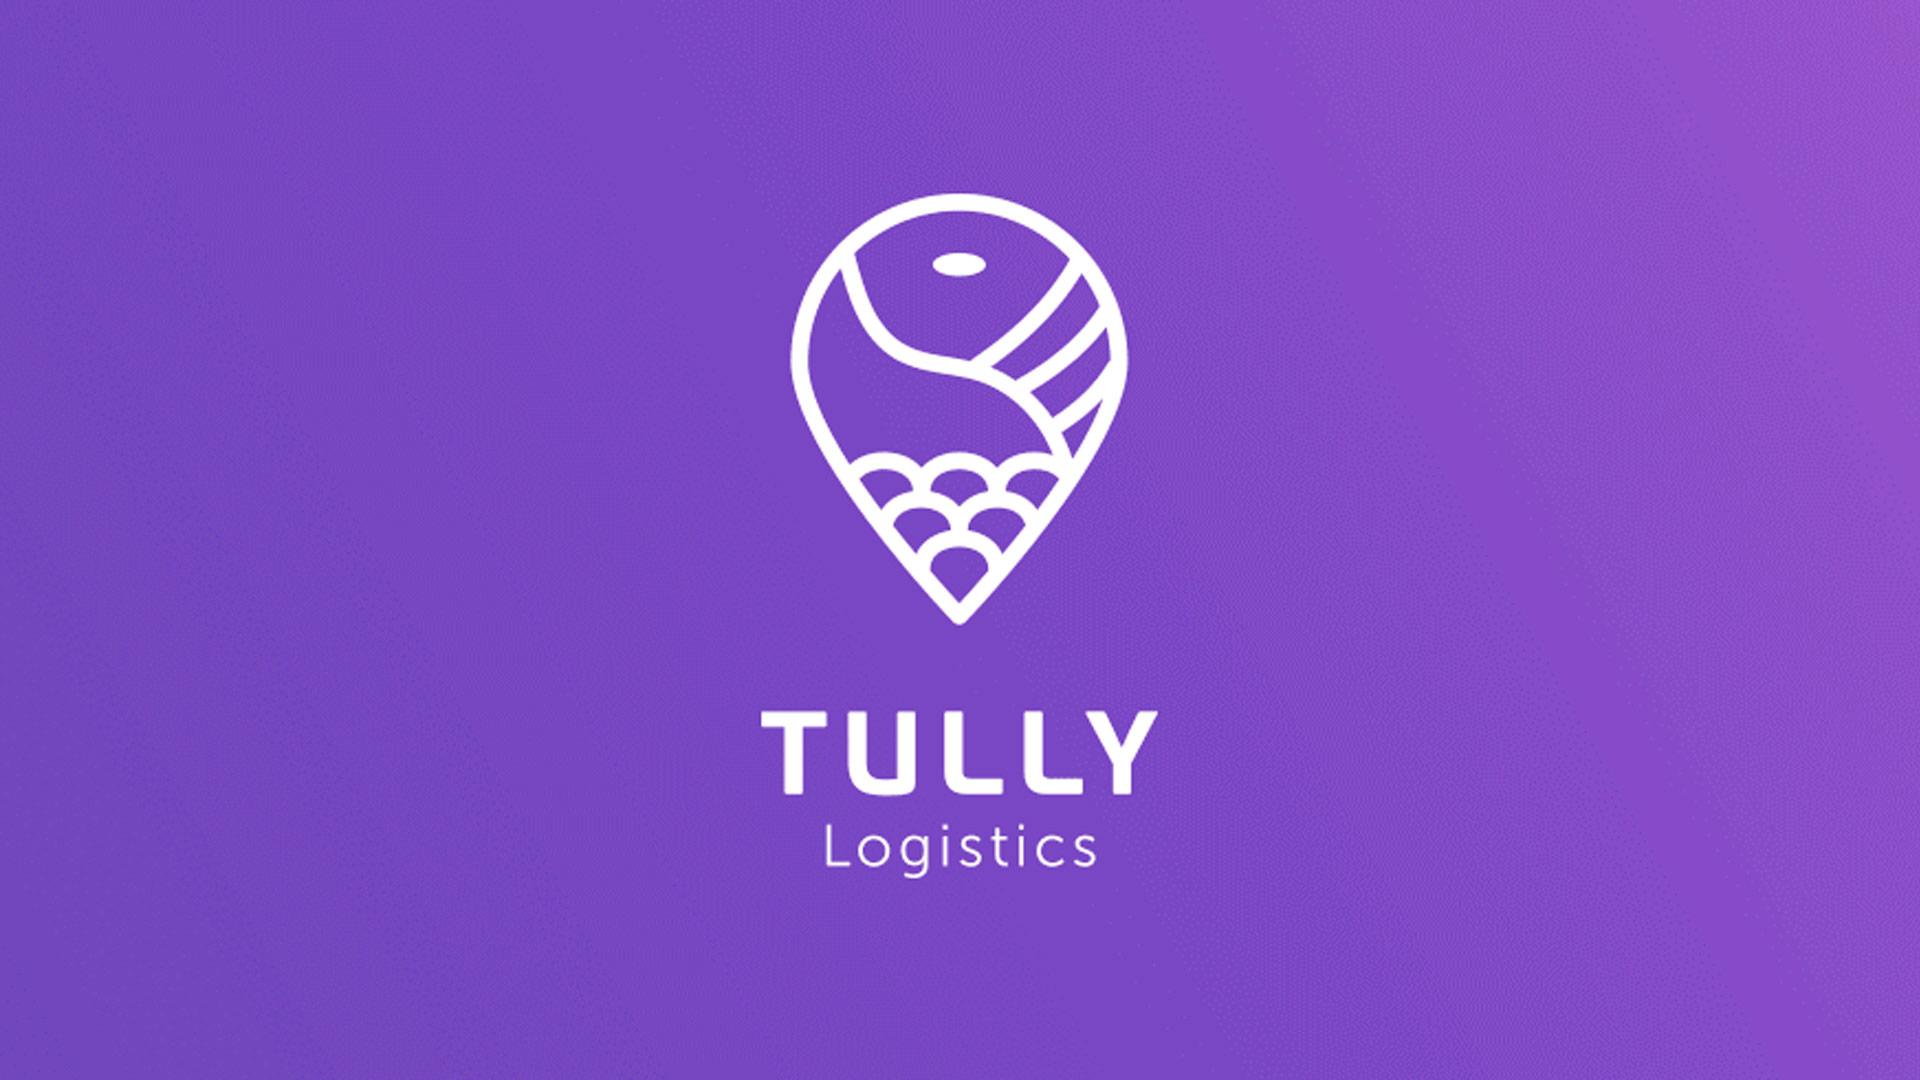 Tully logistics